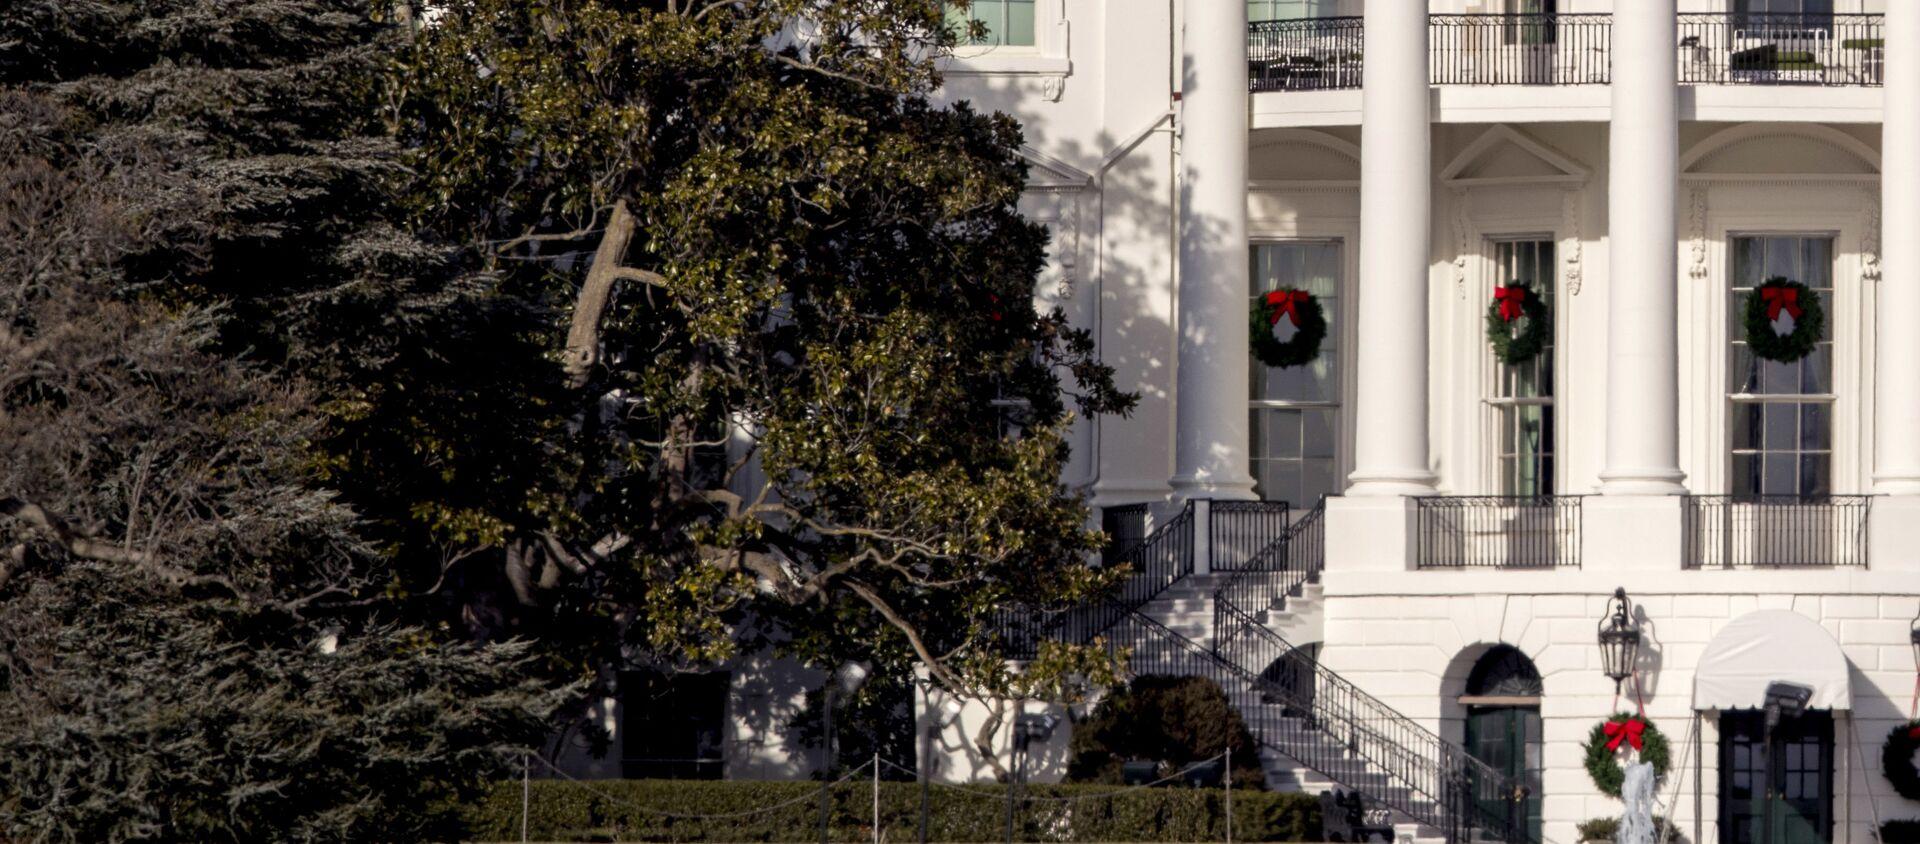 Casa Bianca, Washington, USA - Sputnik Italia, 1920, 15.04.2021